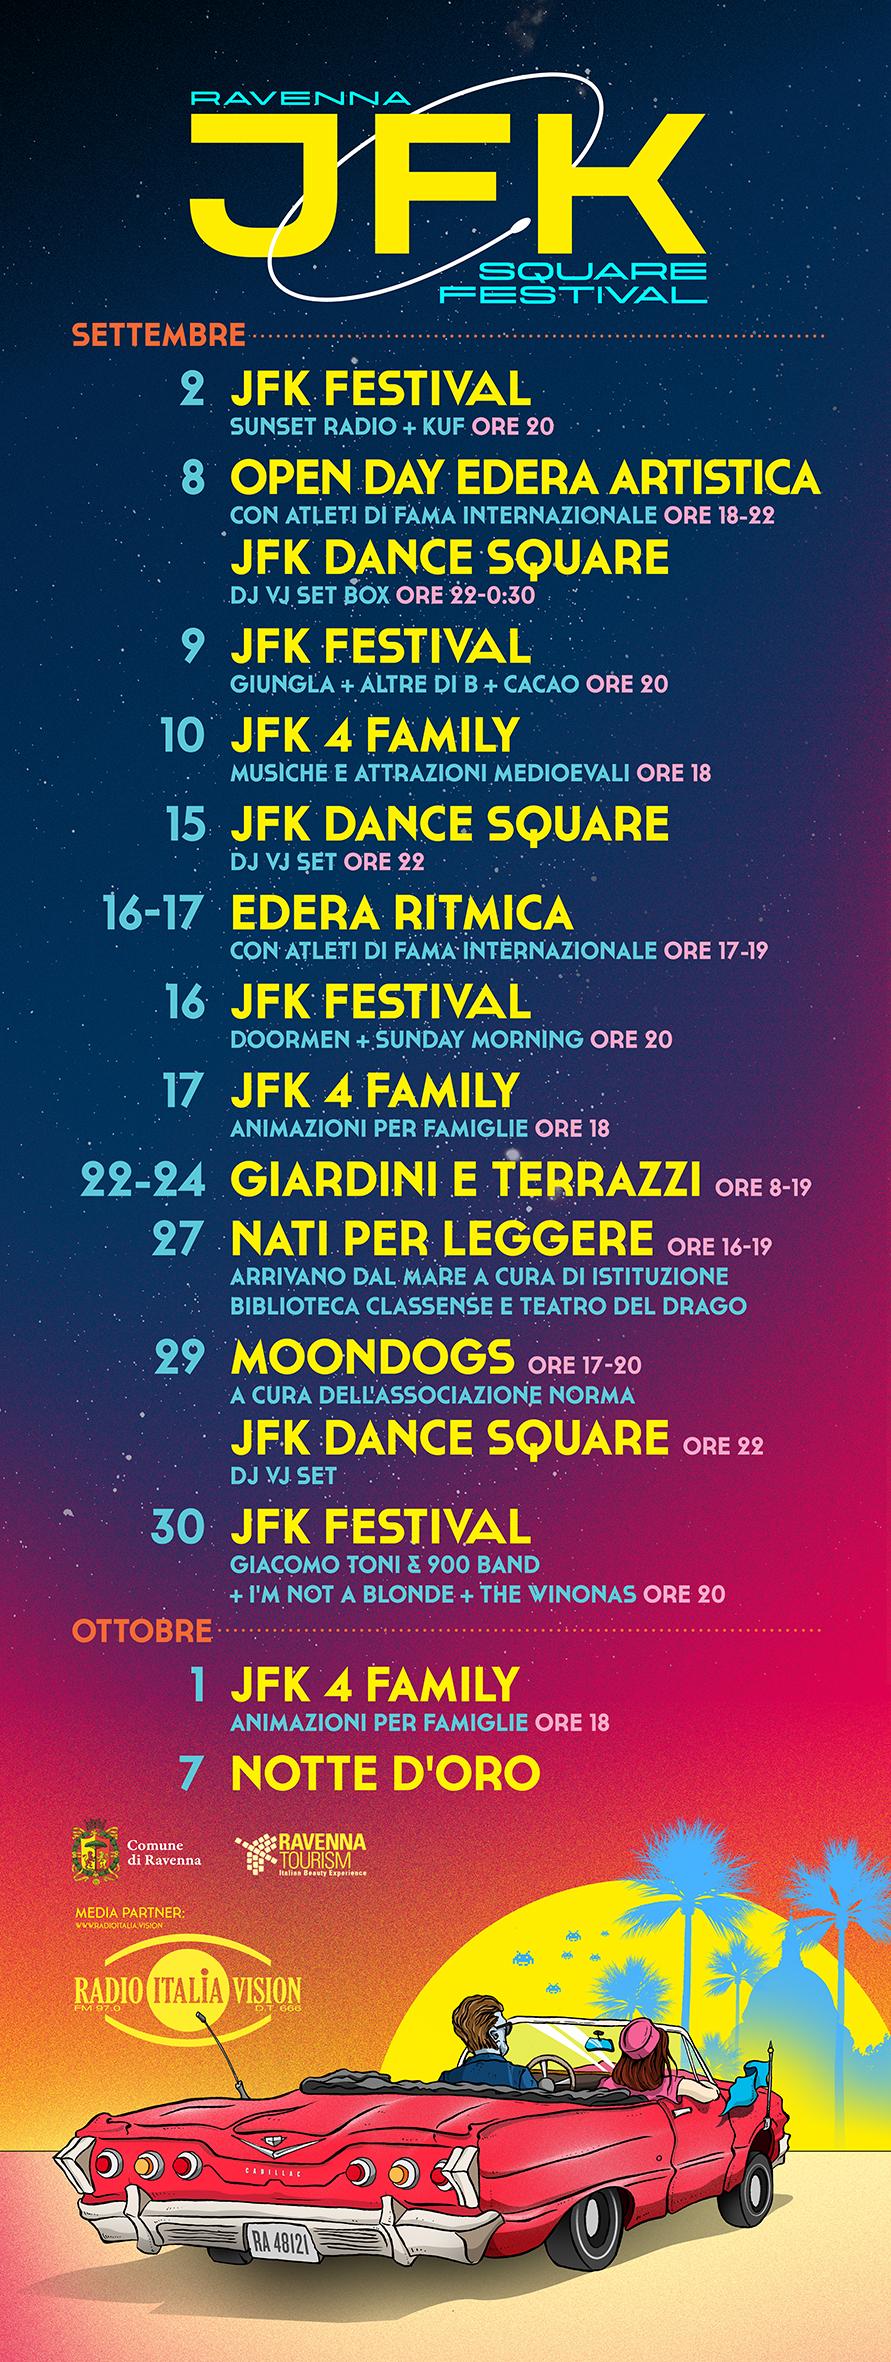 17 08 25 Programma Jfk Square